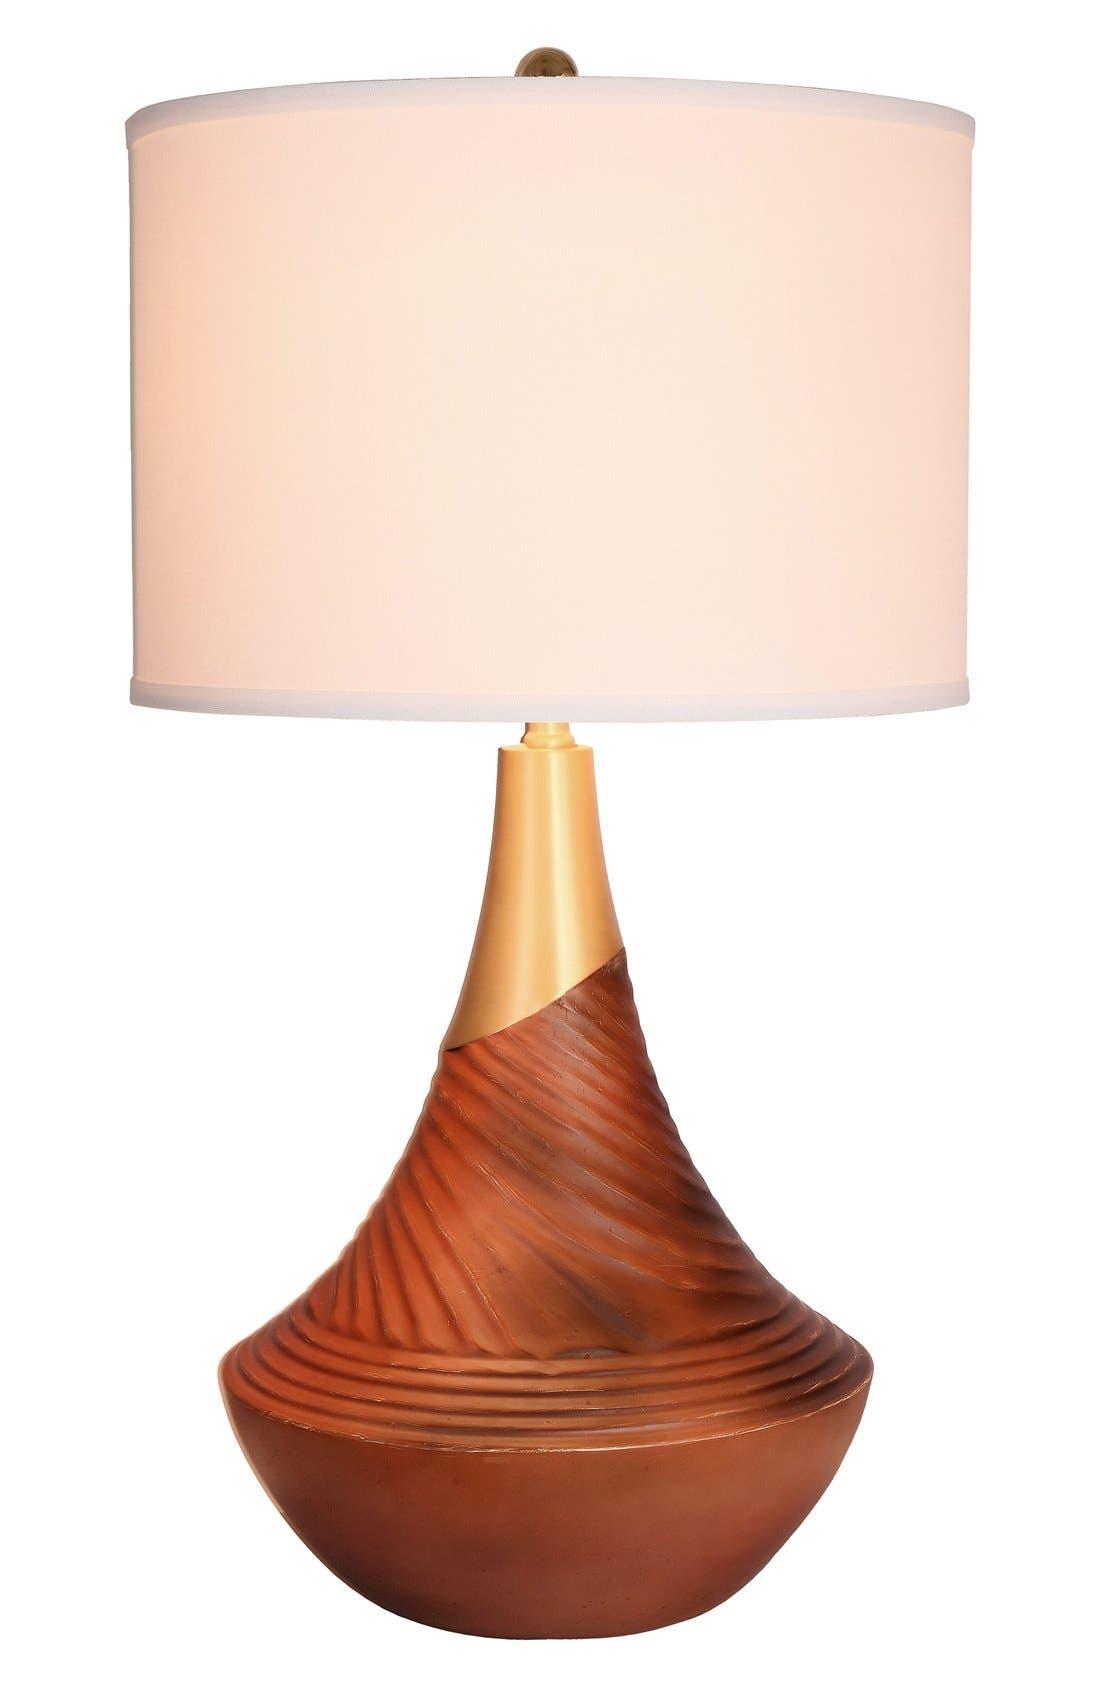 Main Image - JAlexander Cora Resin Table Lamp